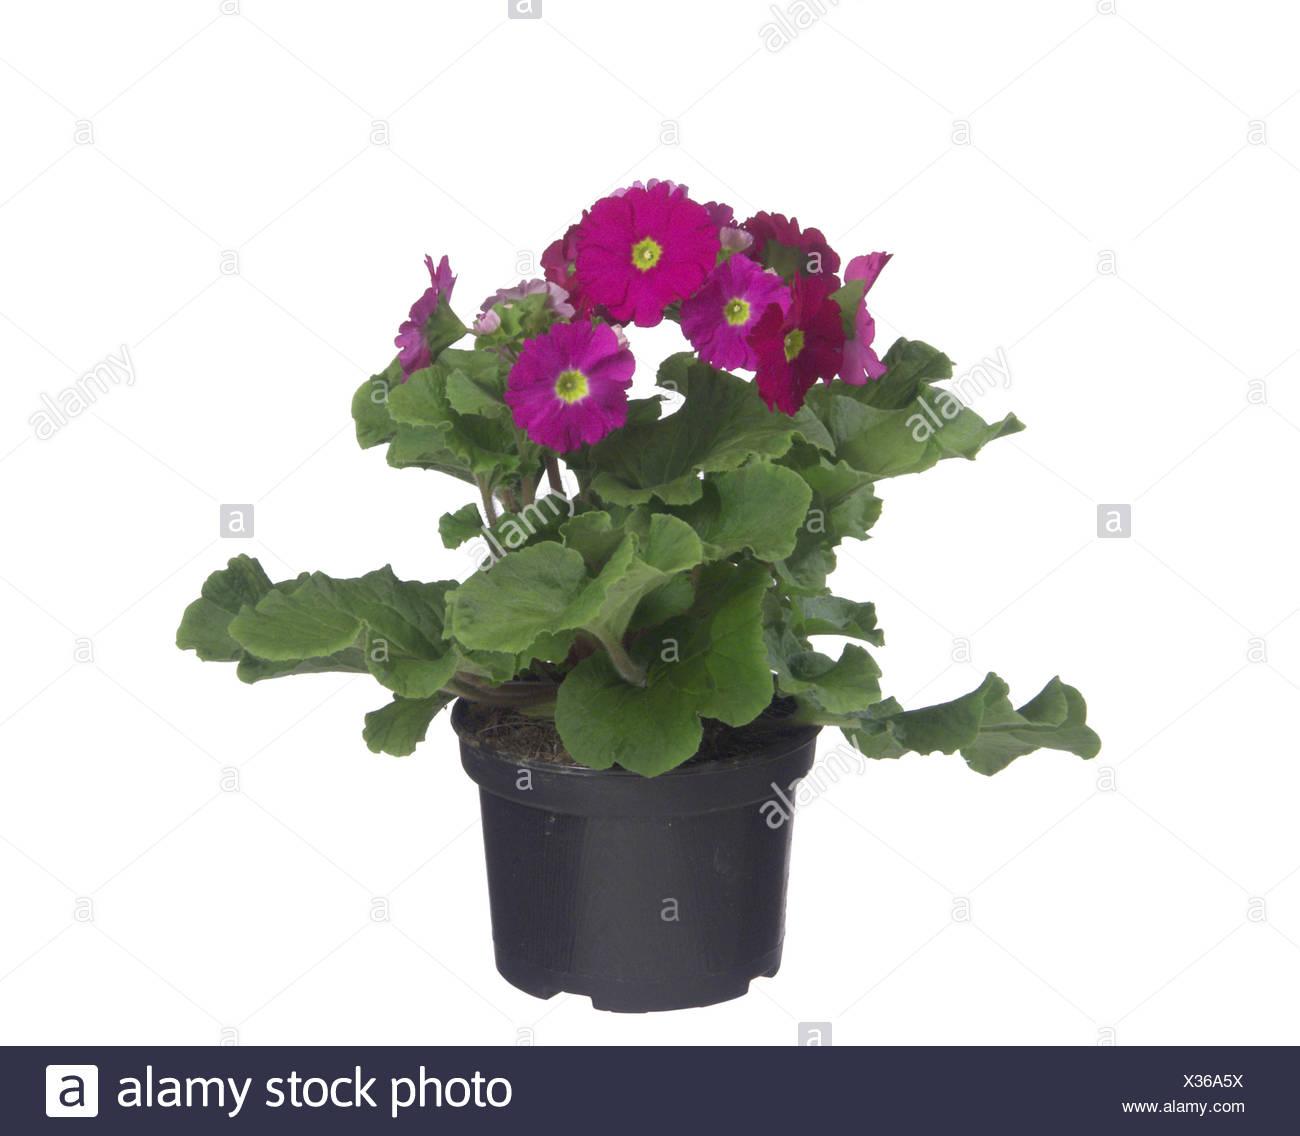 German Primerose, Poison Primerose (Primula obconica), potted plant - Stock Image